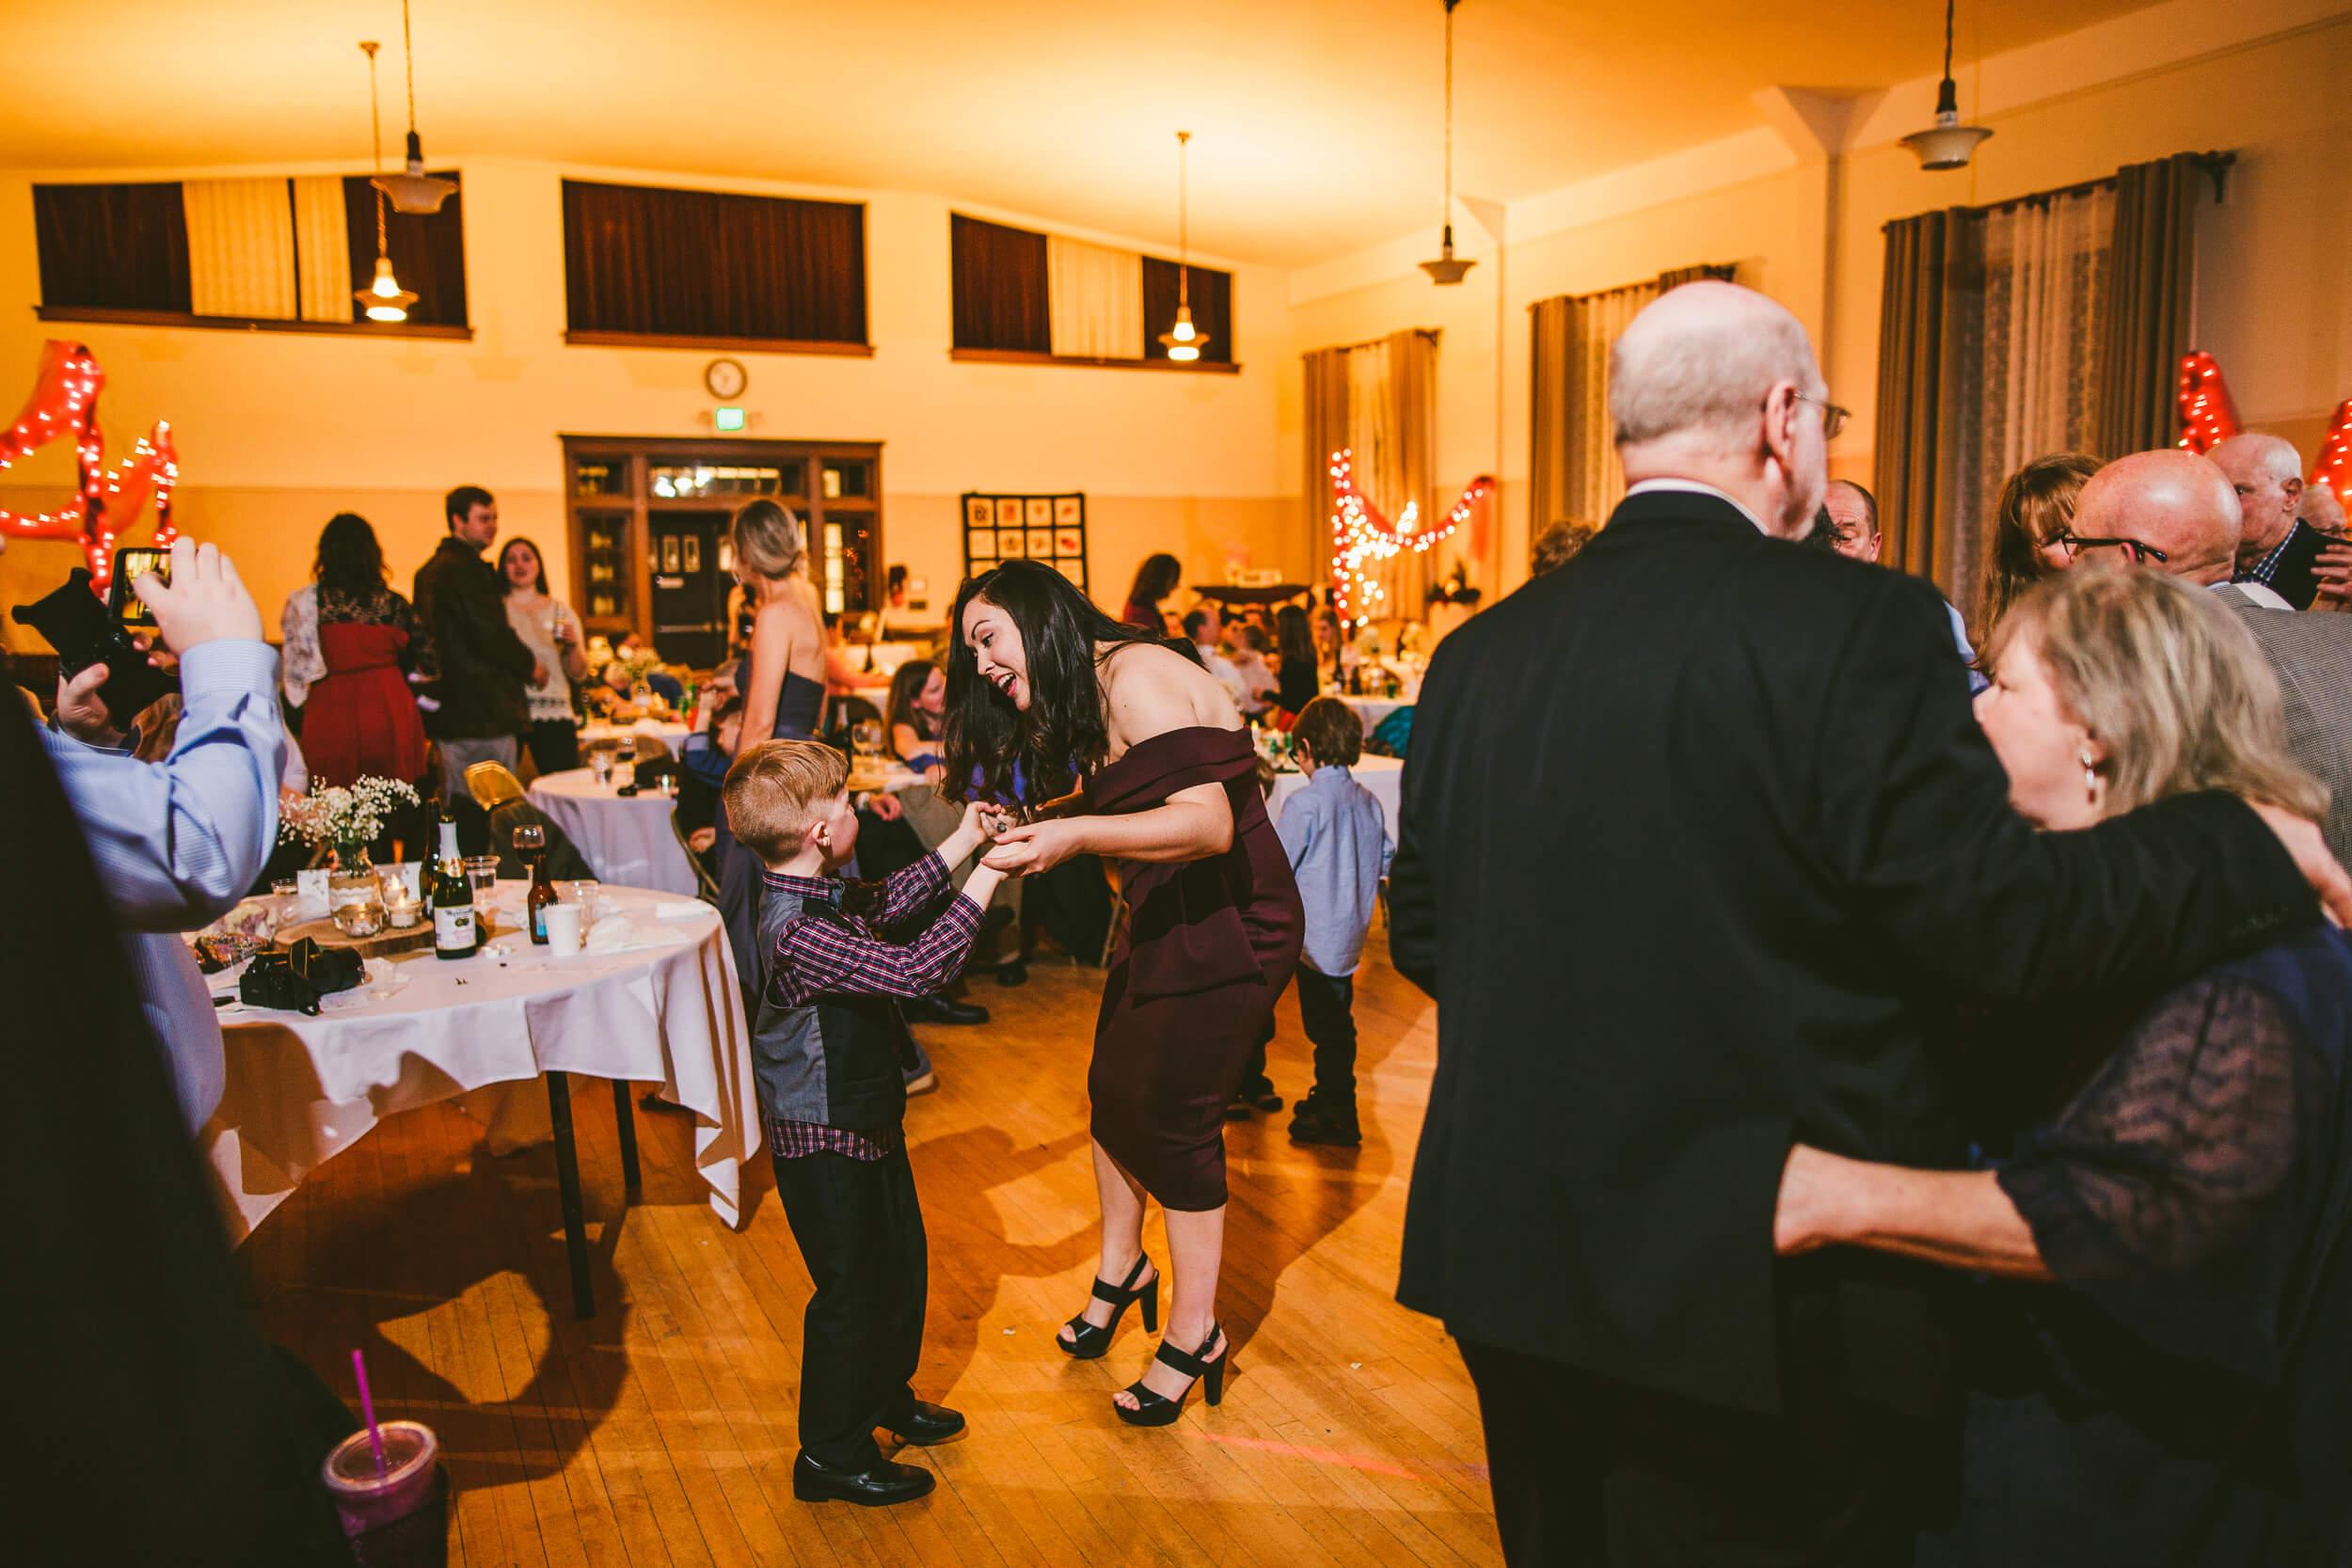 mukogawa winter wedding in spokane (304).jpg